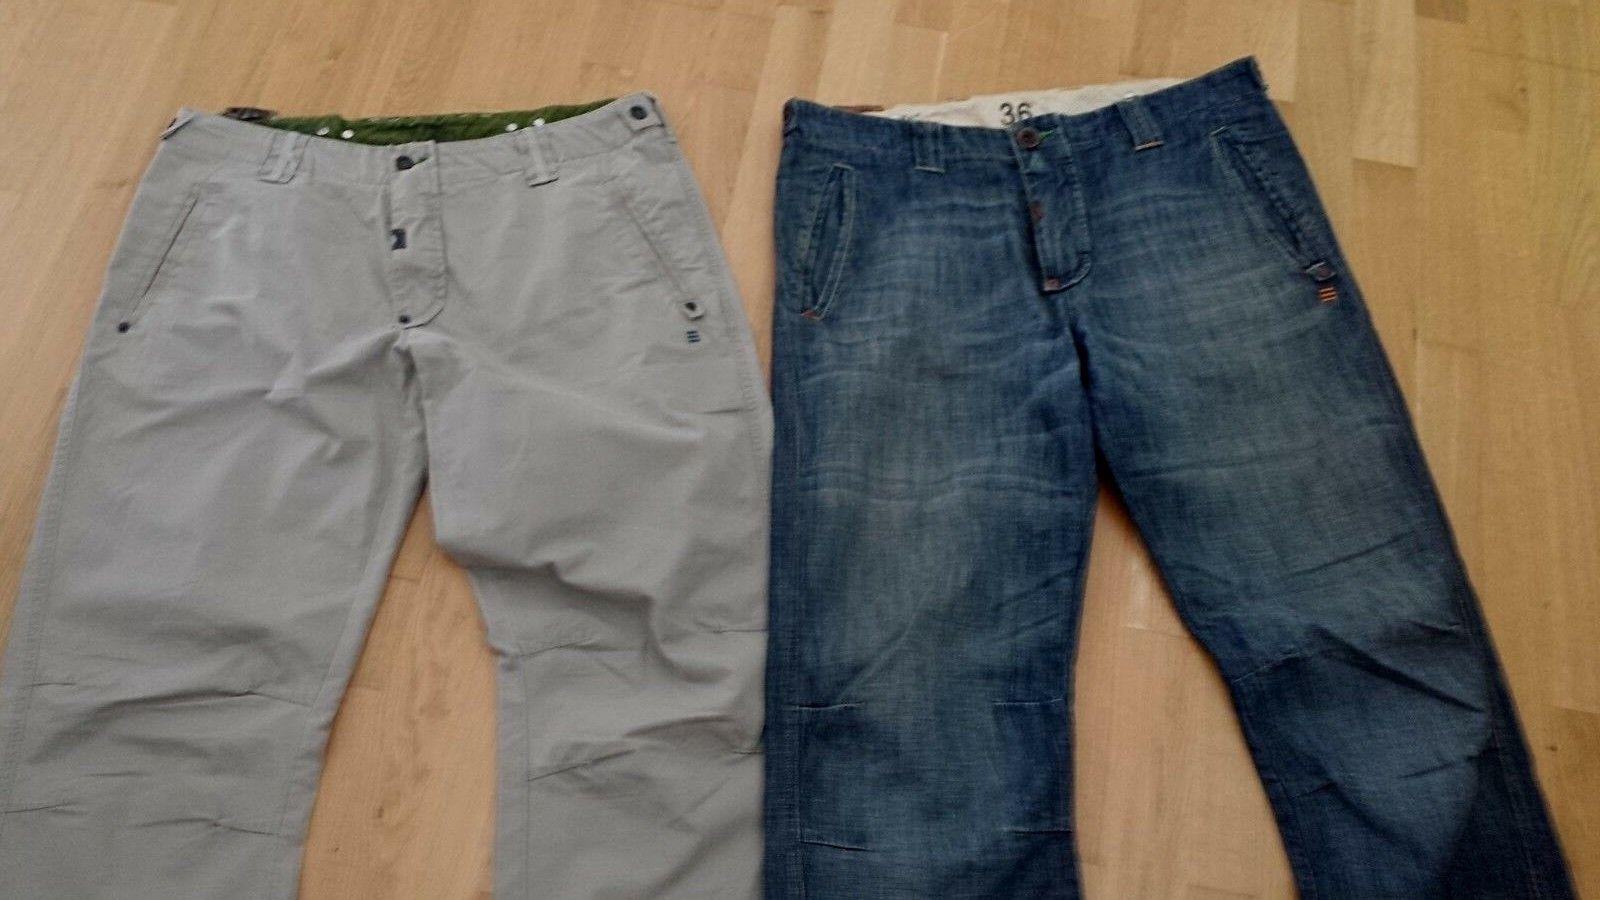 2 Stk. AEM KEI Beige Hose neu mit Etikett   Blau Jeans Hose ohne Etikett